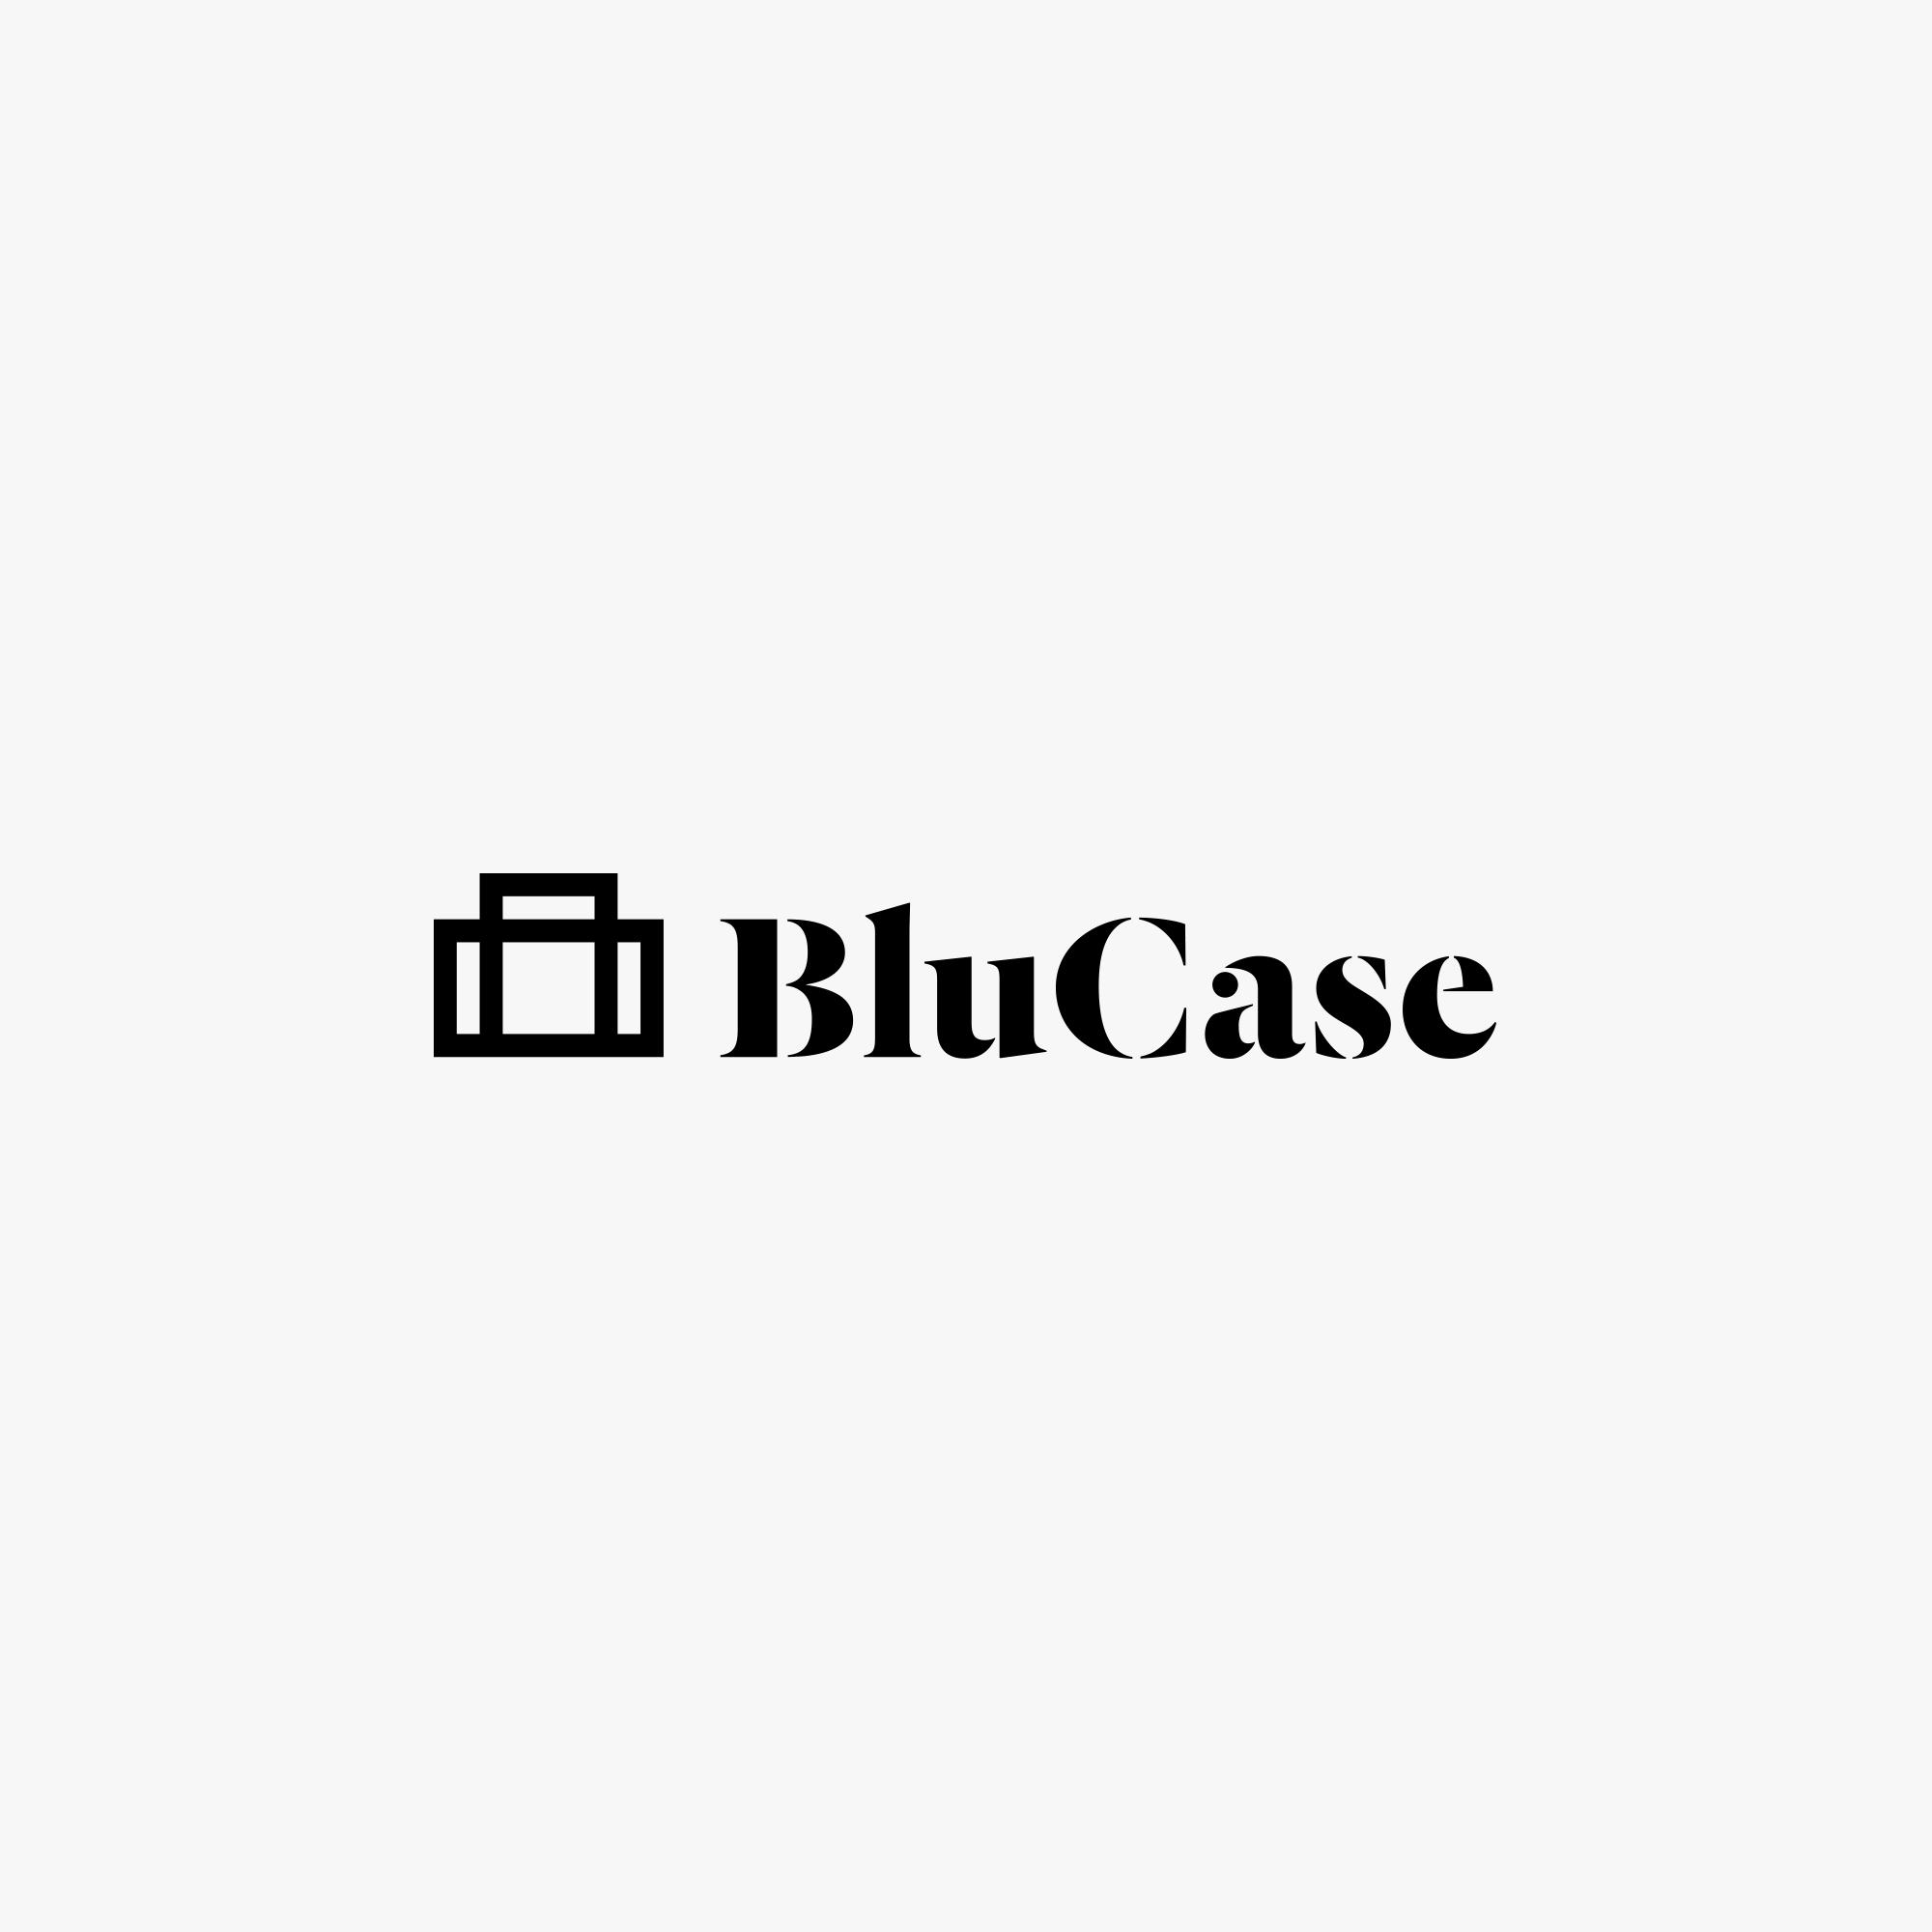 pauldersidan_blucase_logo_1.jpg